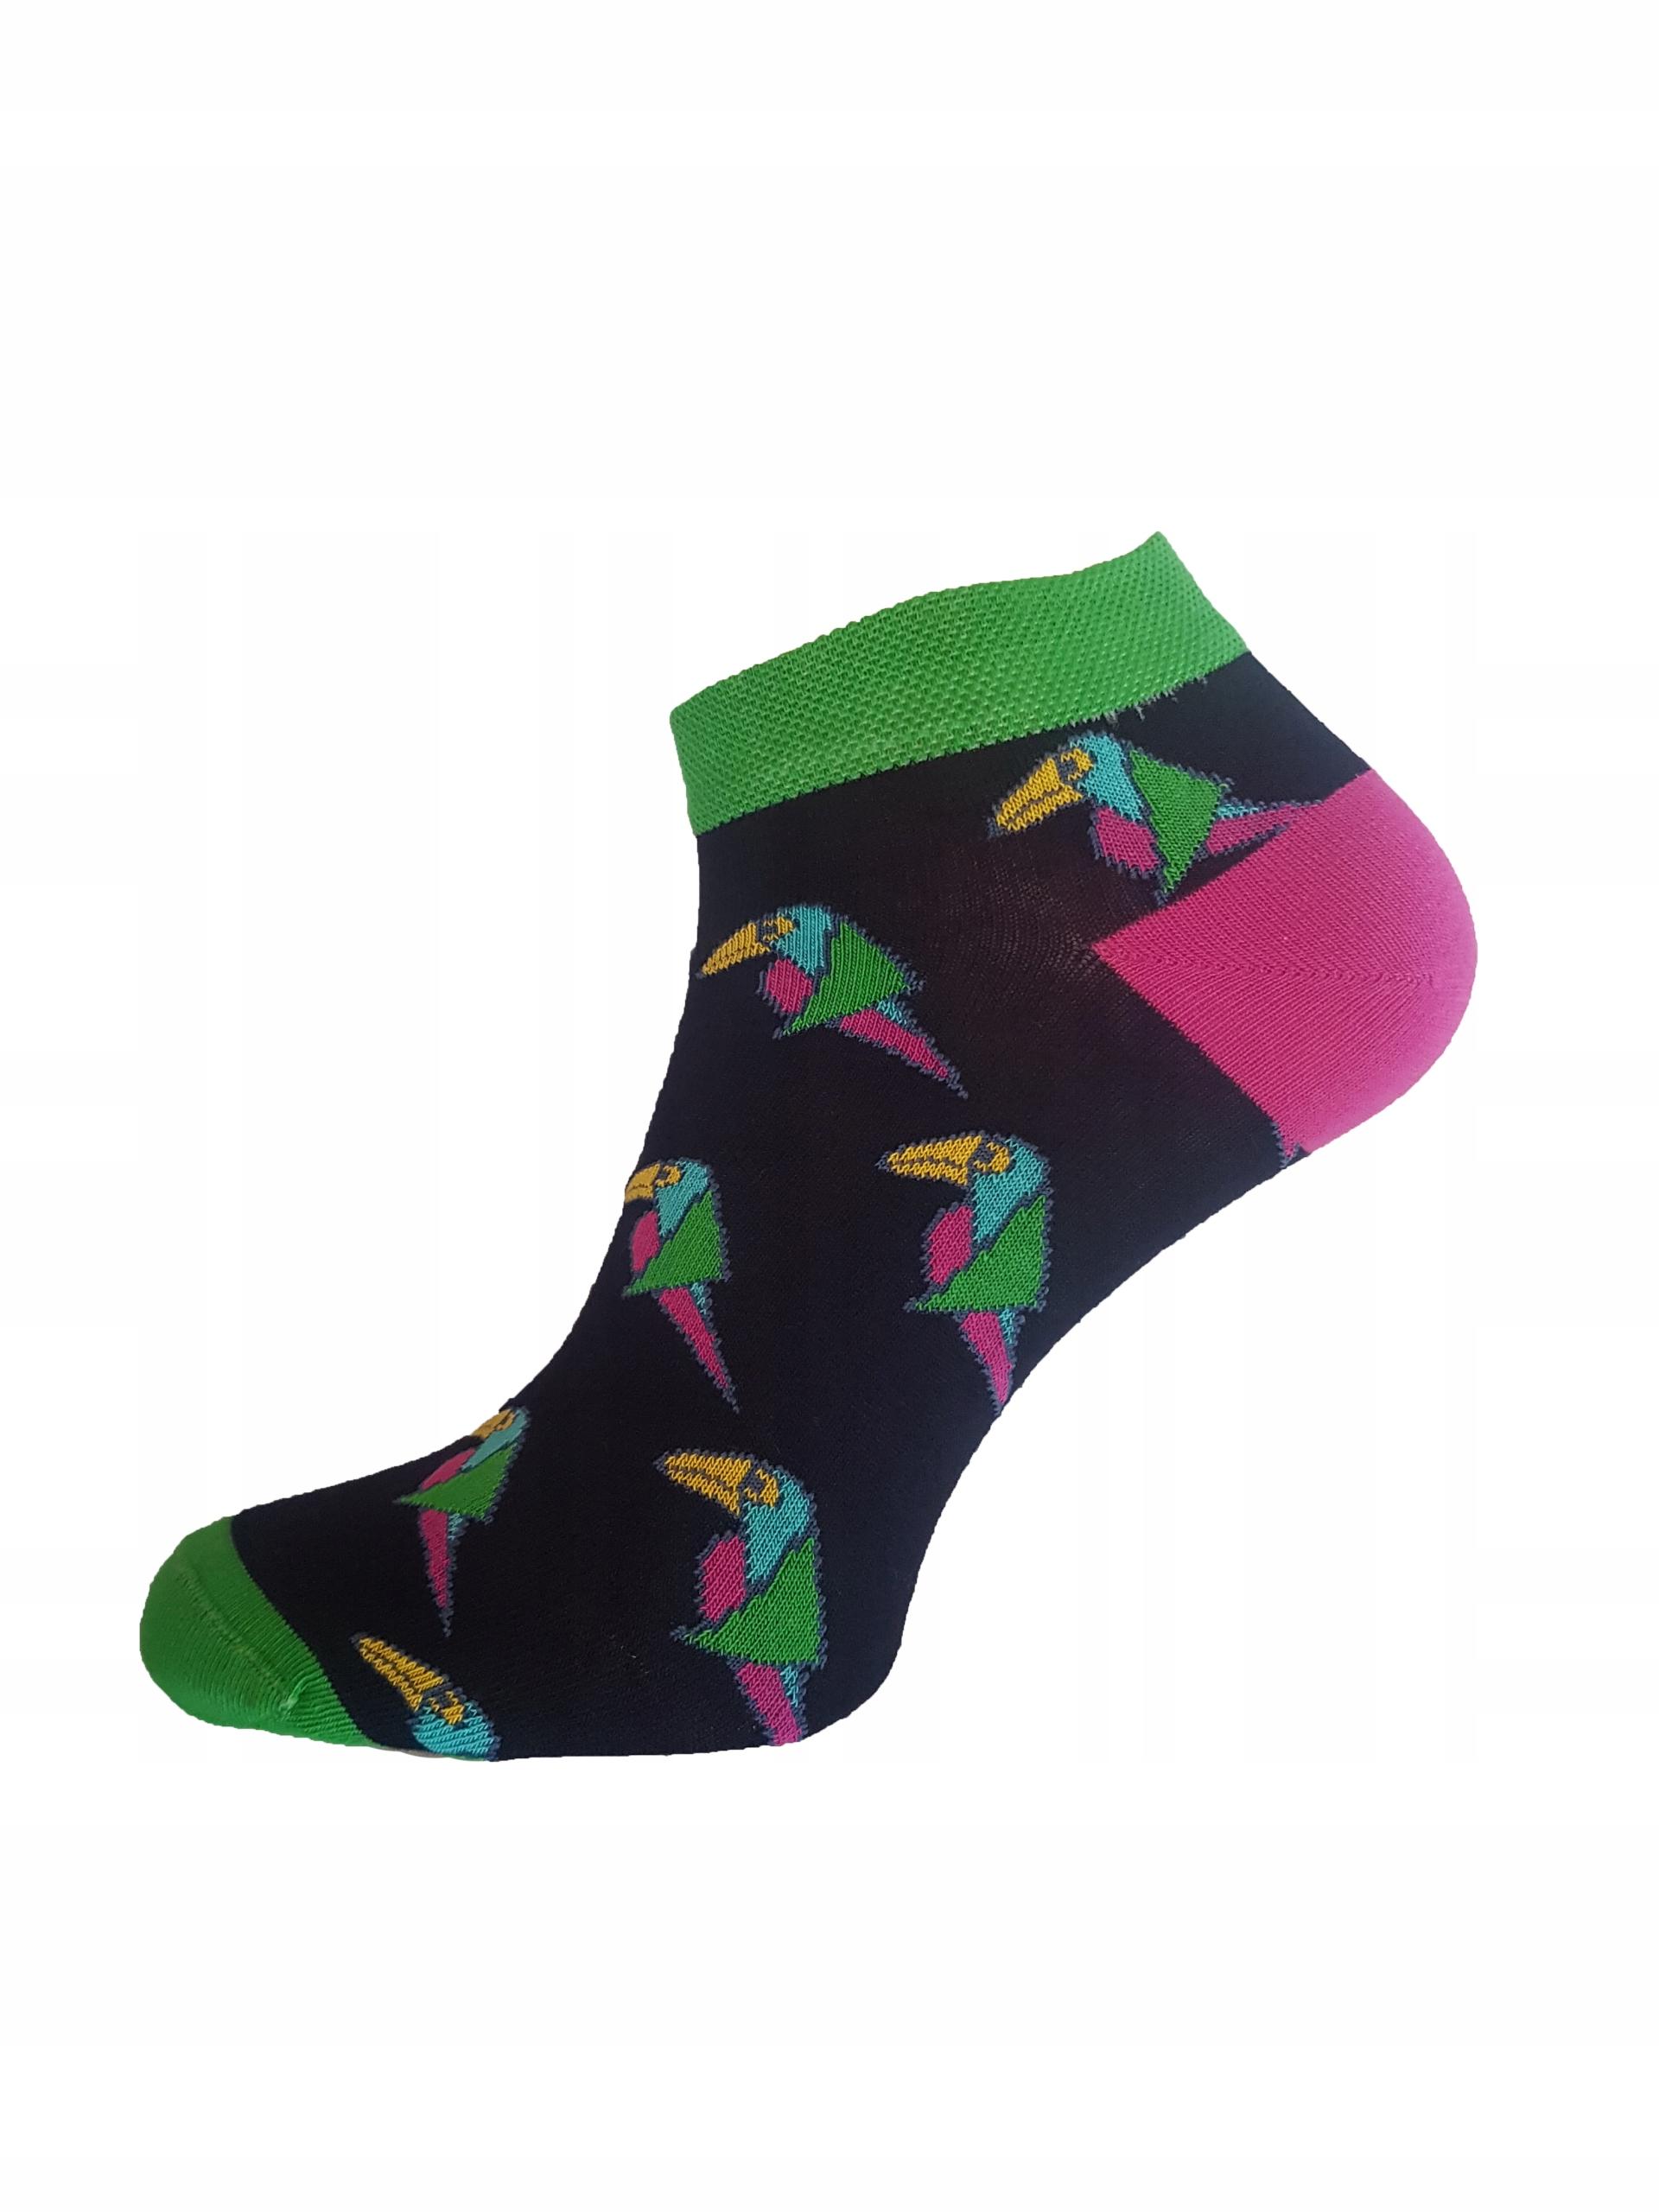 Modne Kolorowe Stopki Papugi Roz: 42-44